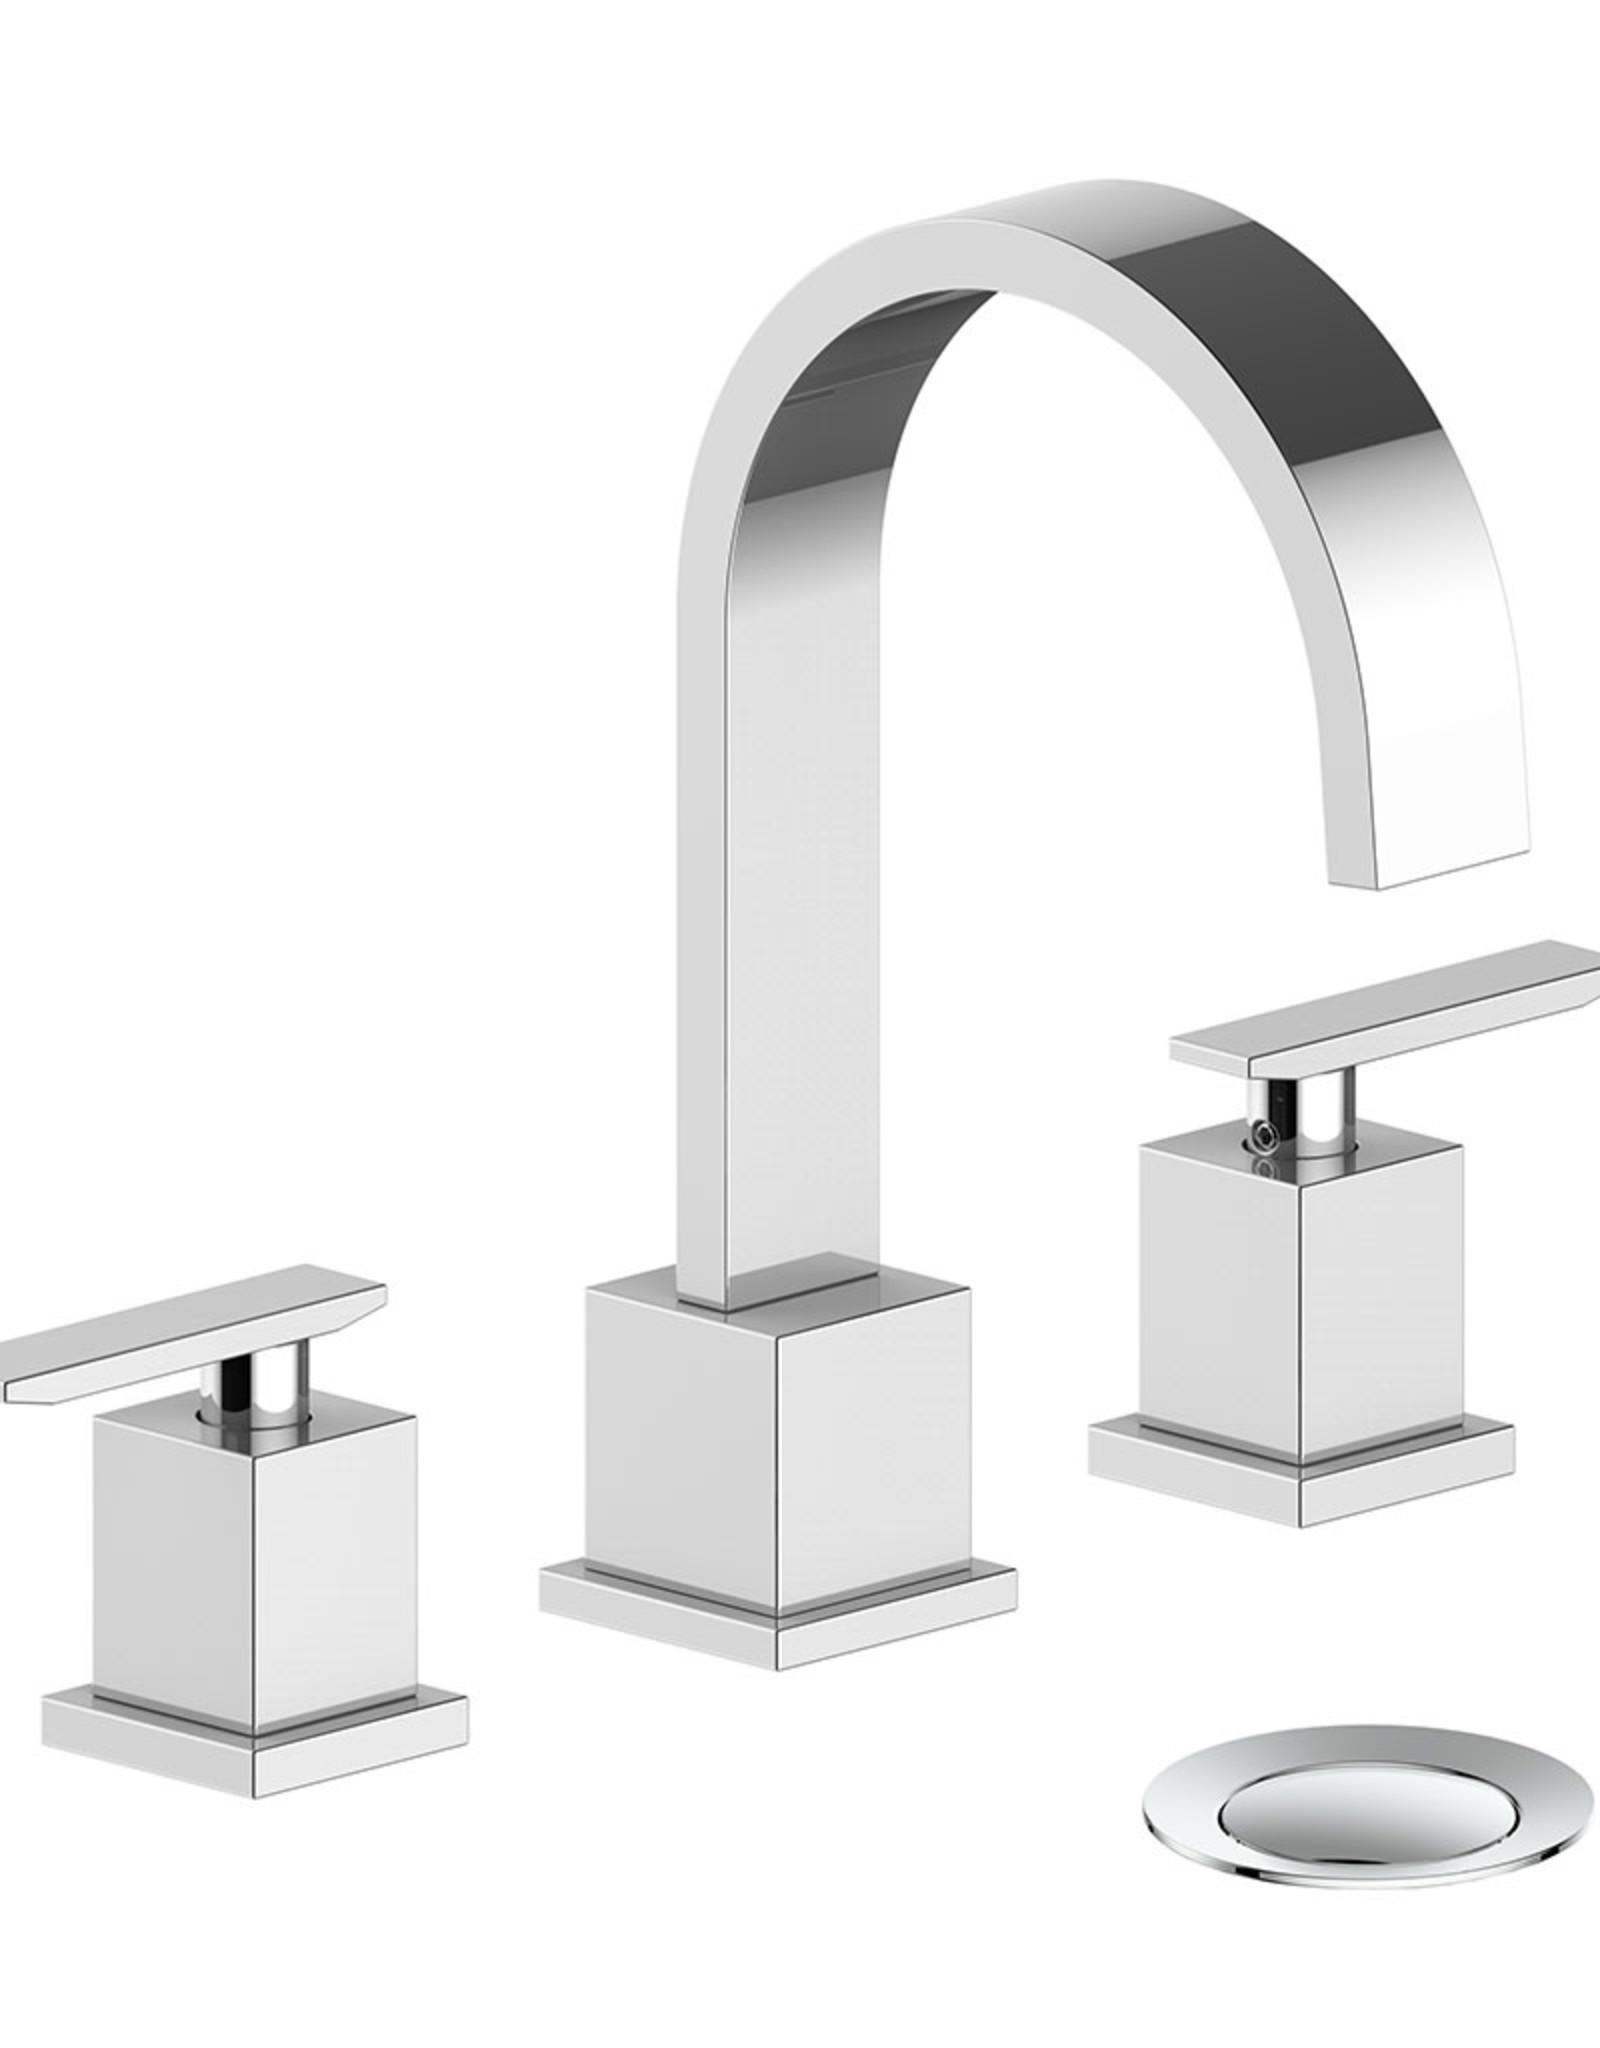 "Vogt Kapfenberg- 8"" Centre Lav Faucet- Chrome"